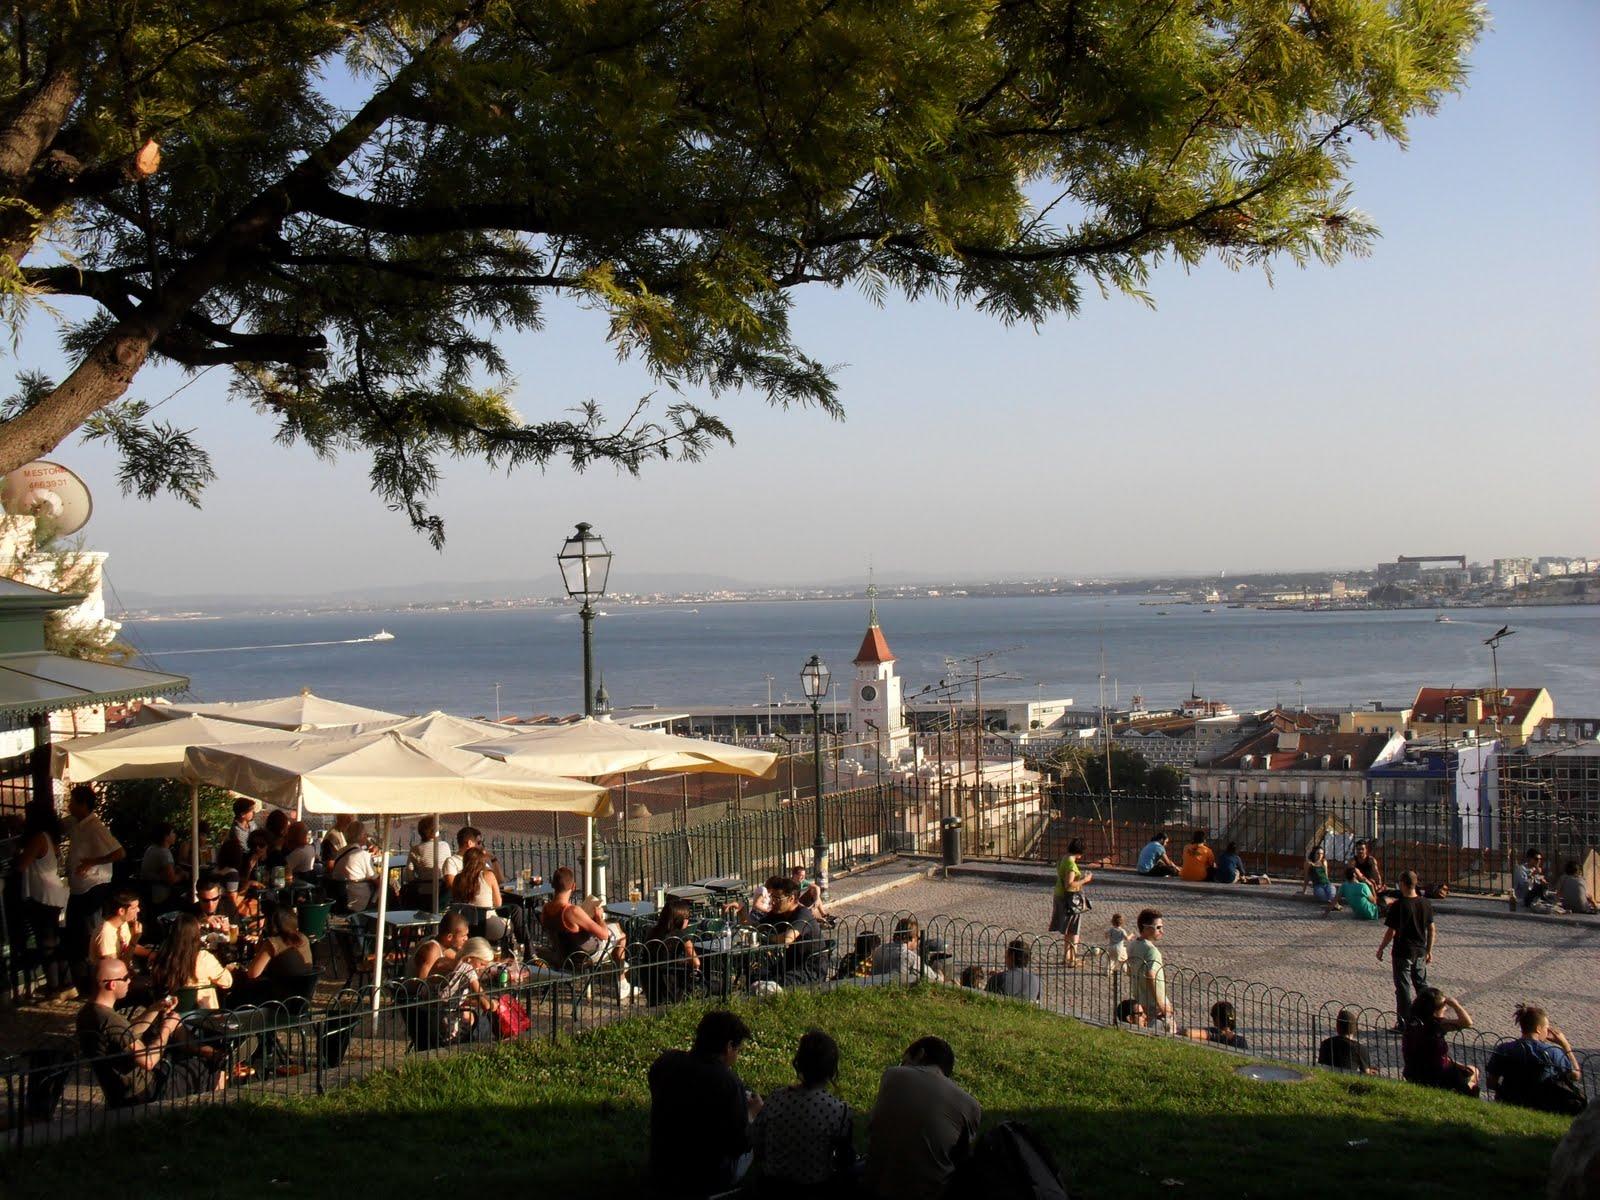 2. LISBON, PORTUGAL